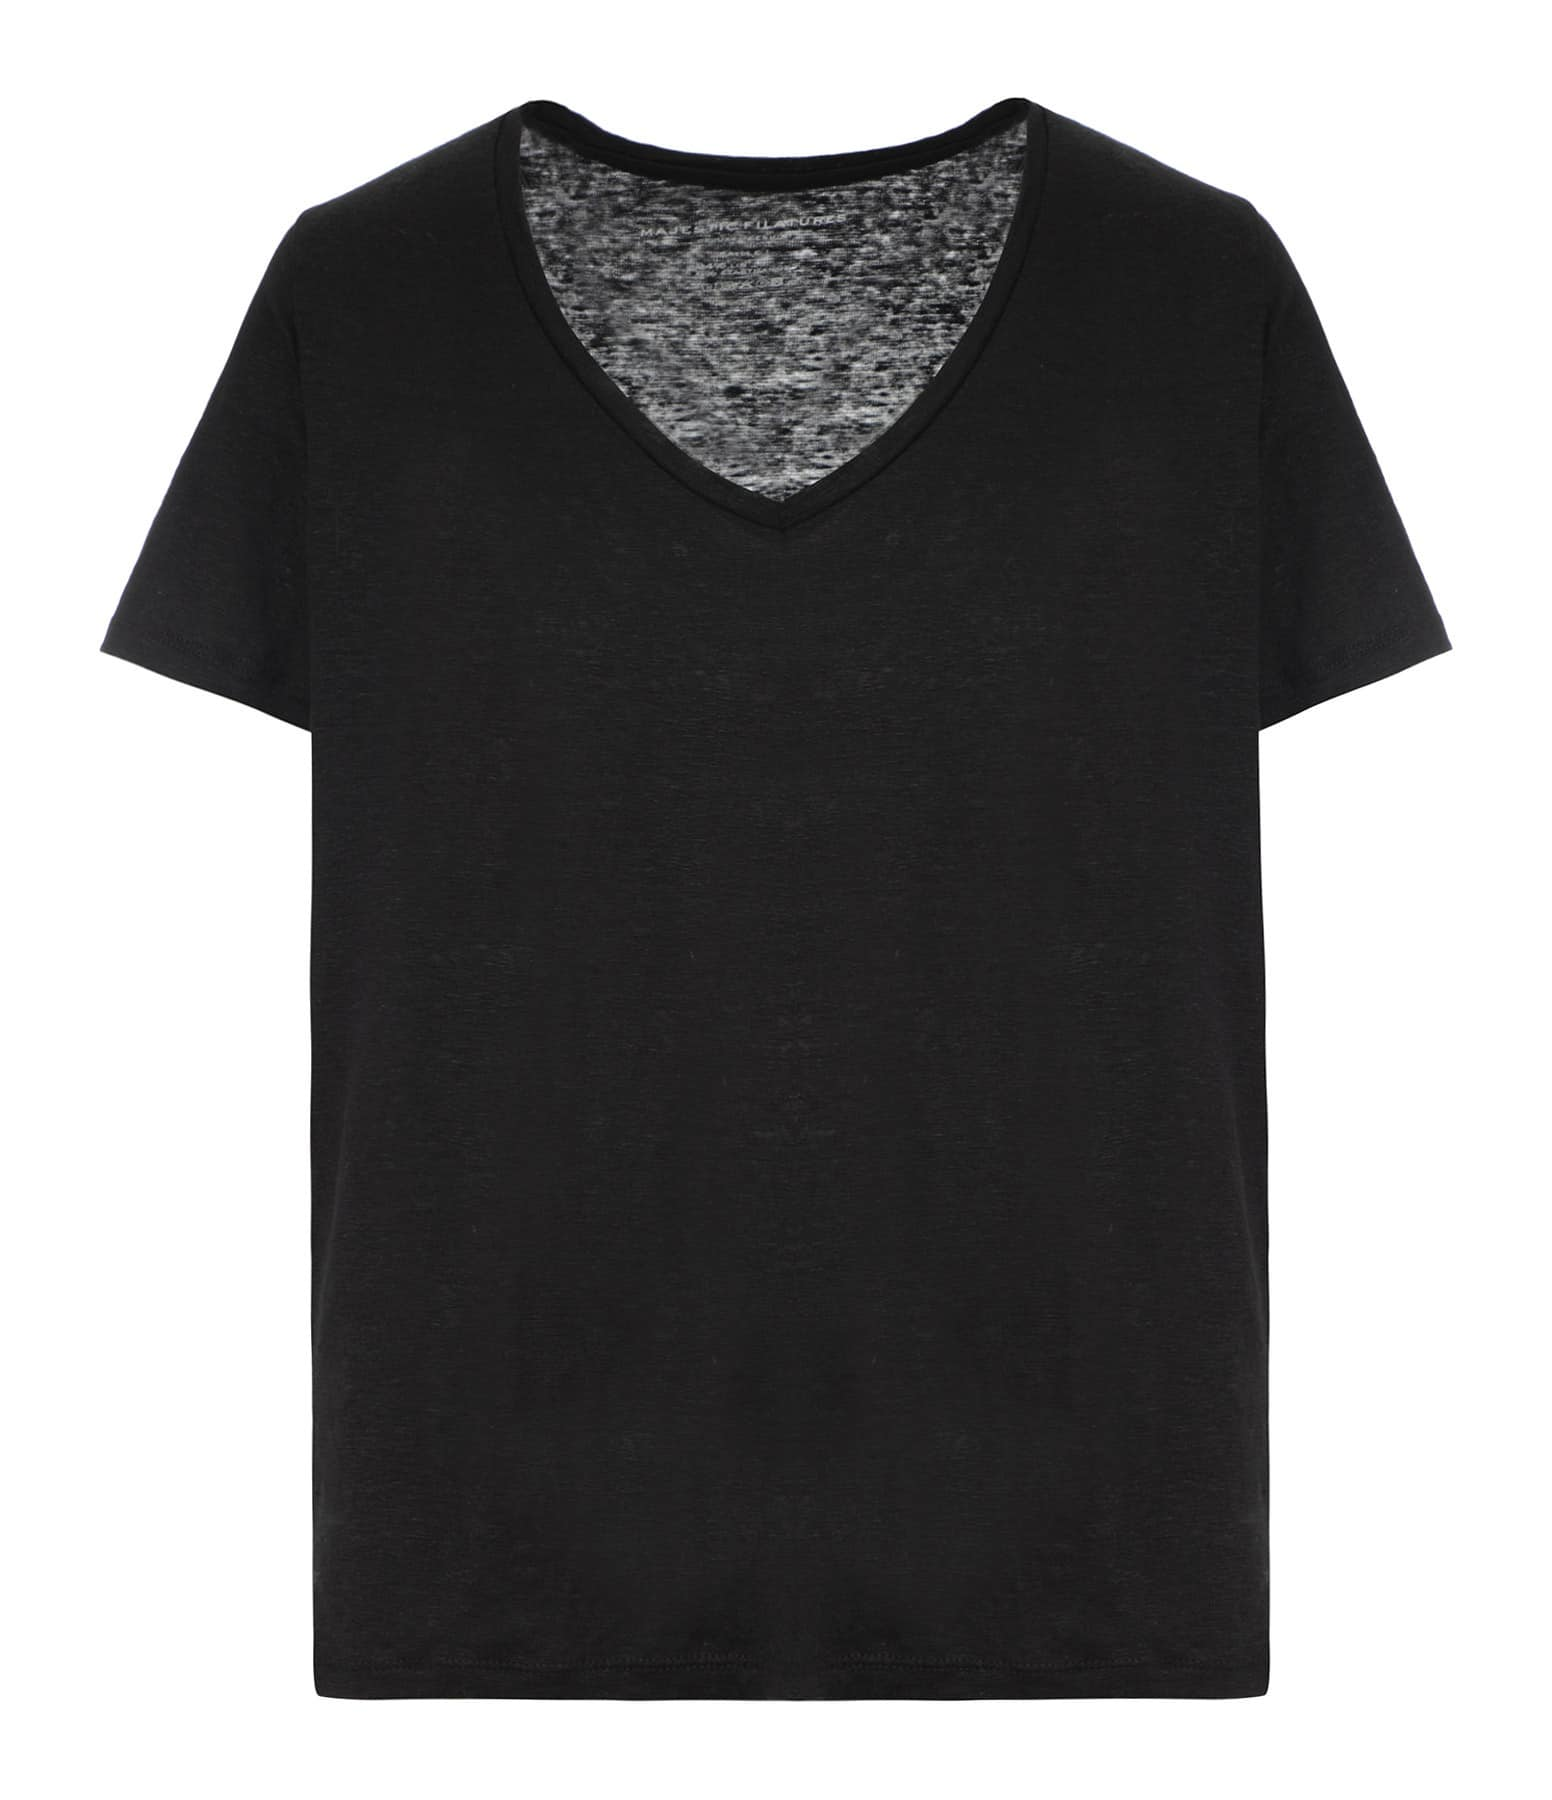 MAJESTIC FILATURES - Tee-shirt Col V Lin Noir